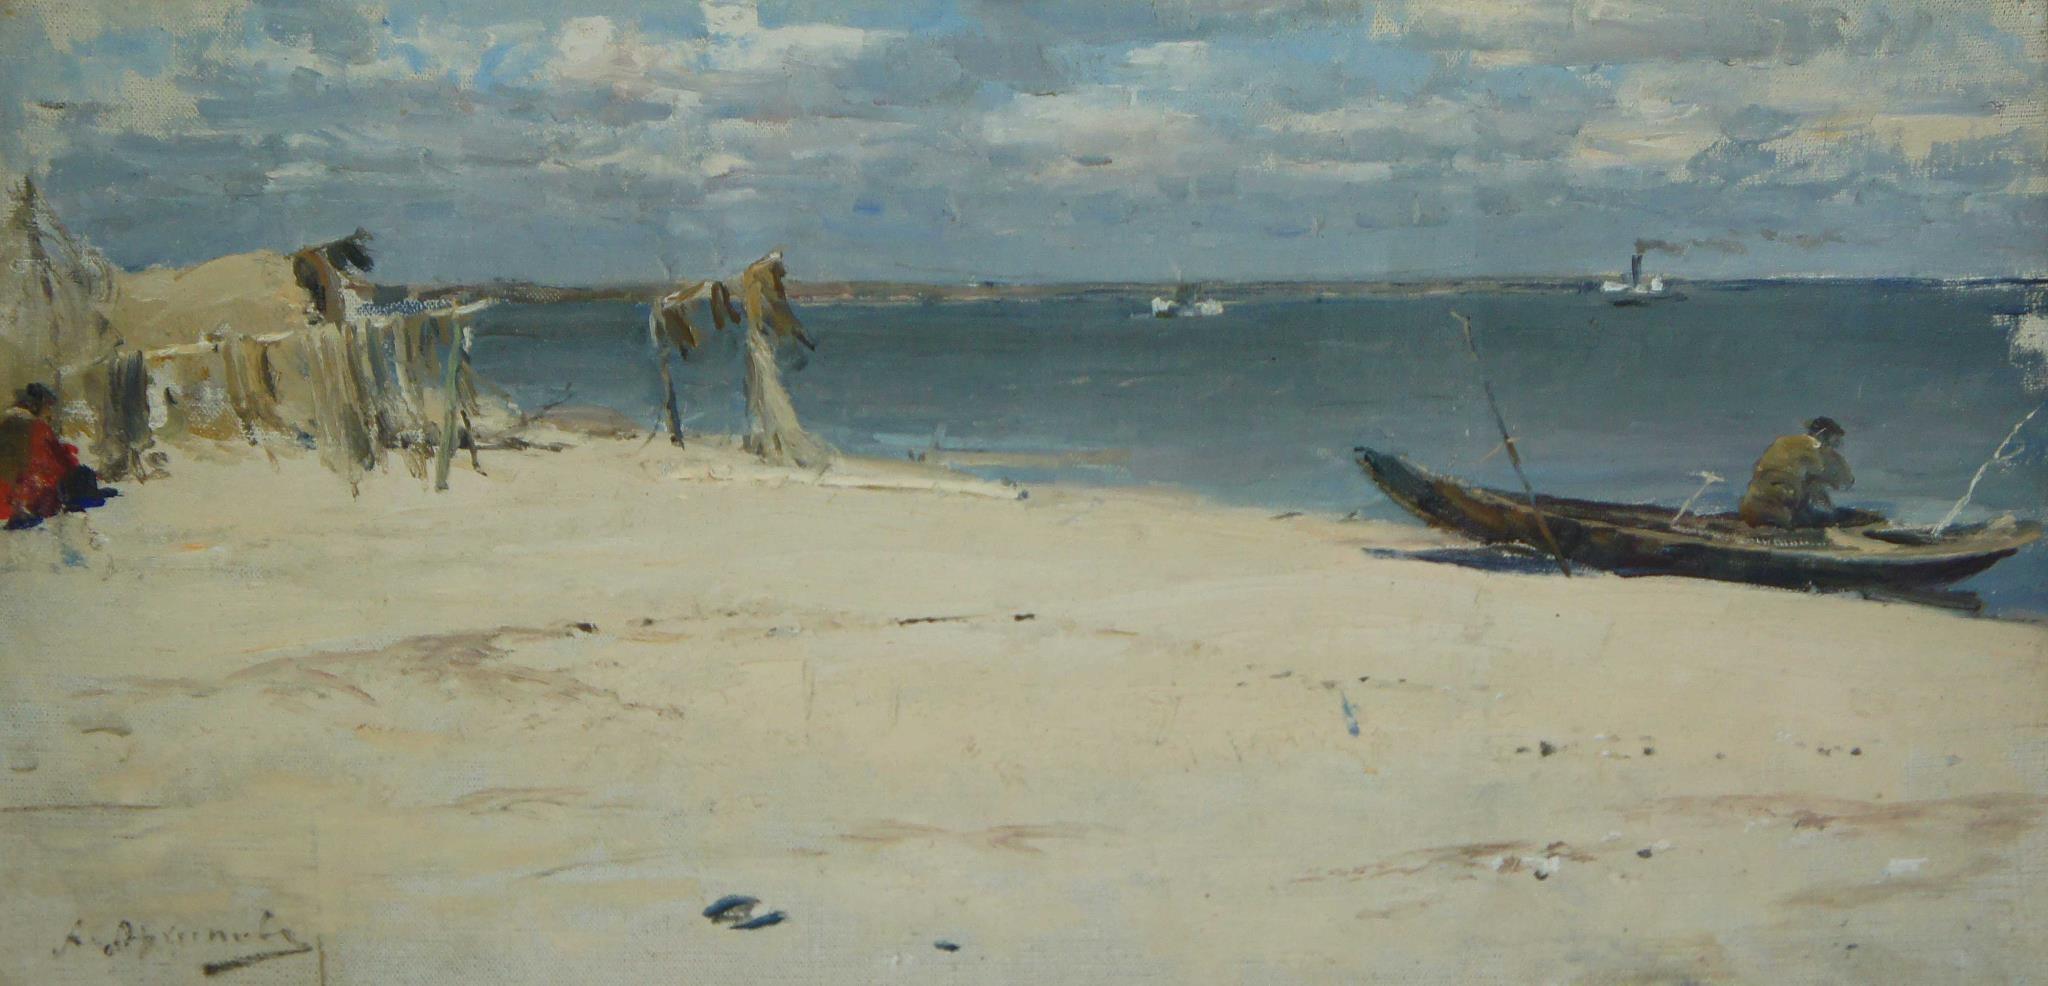 Архипов Абрам картина На Оке Этюд 1890 холст масло